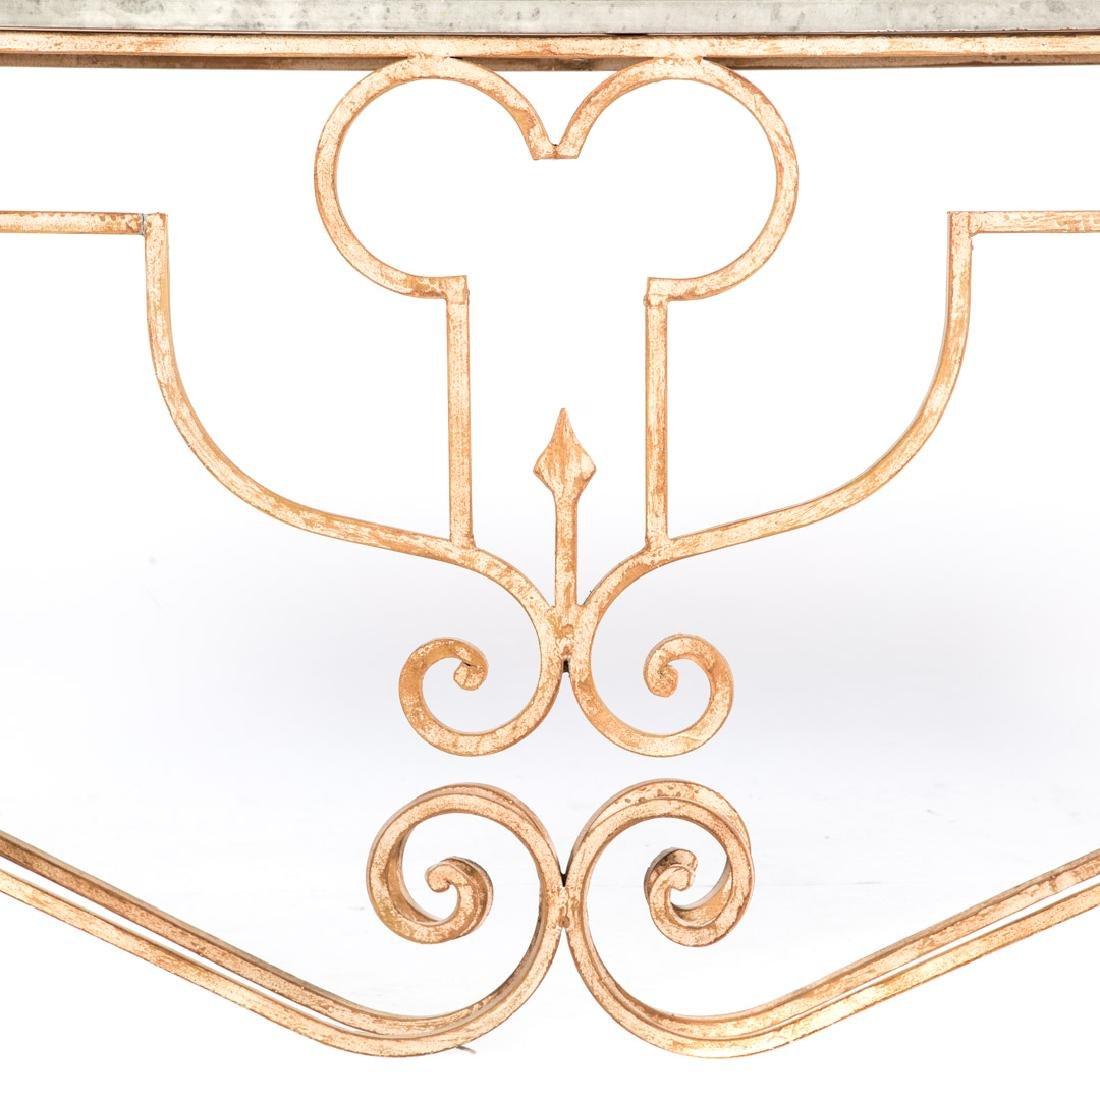 Italian Rococo style iron console table, - 3